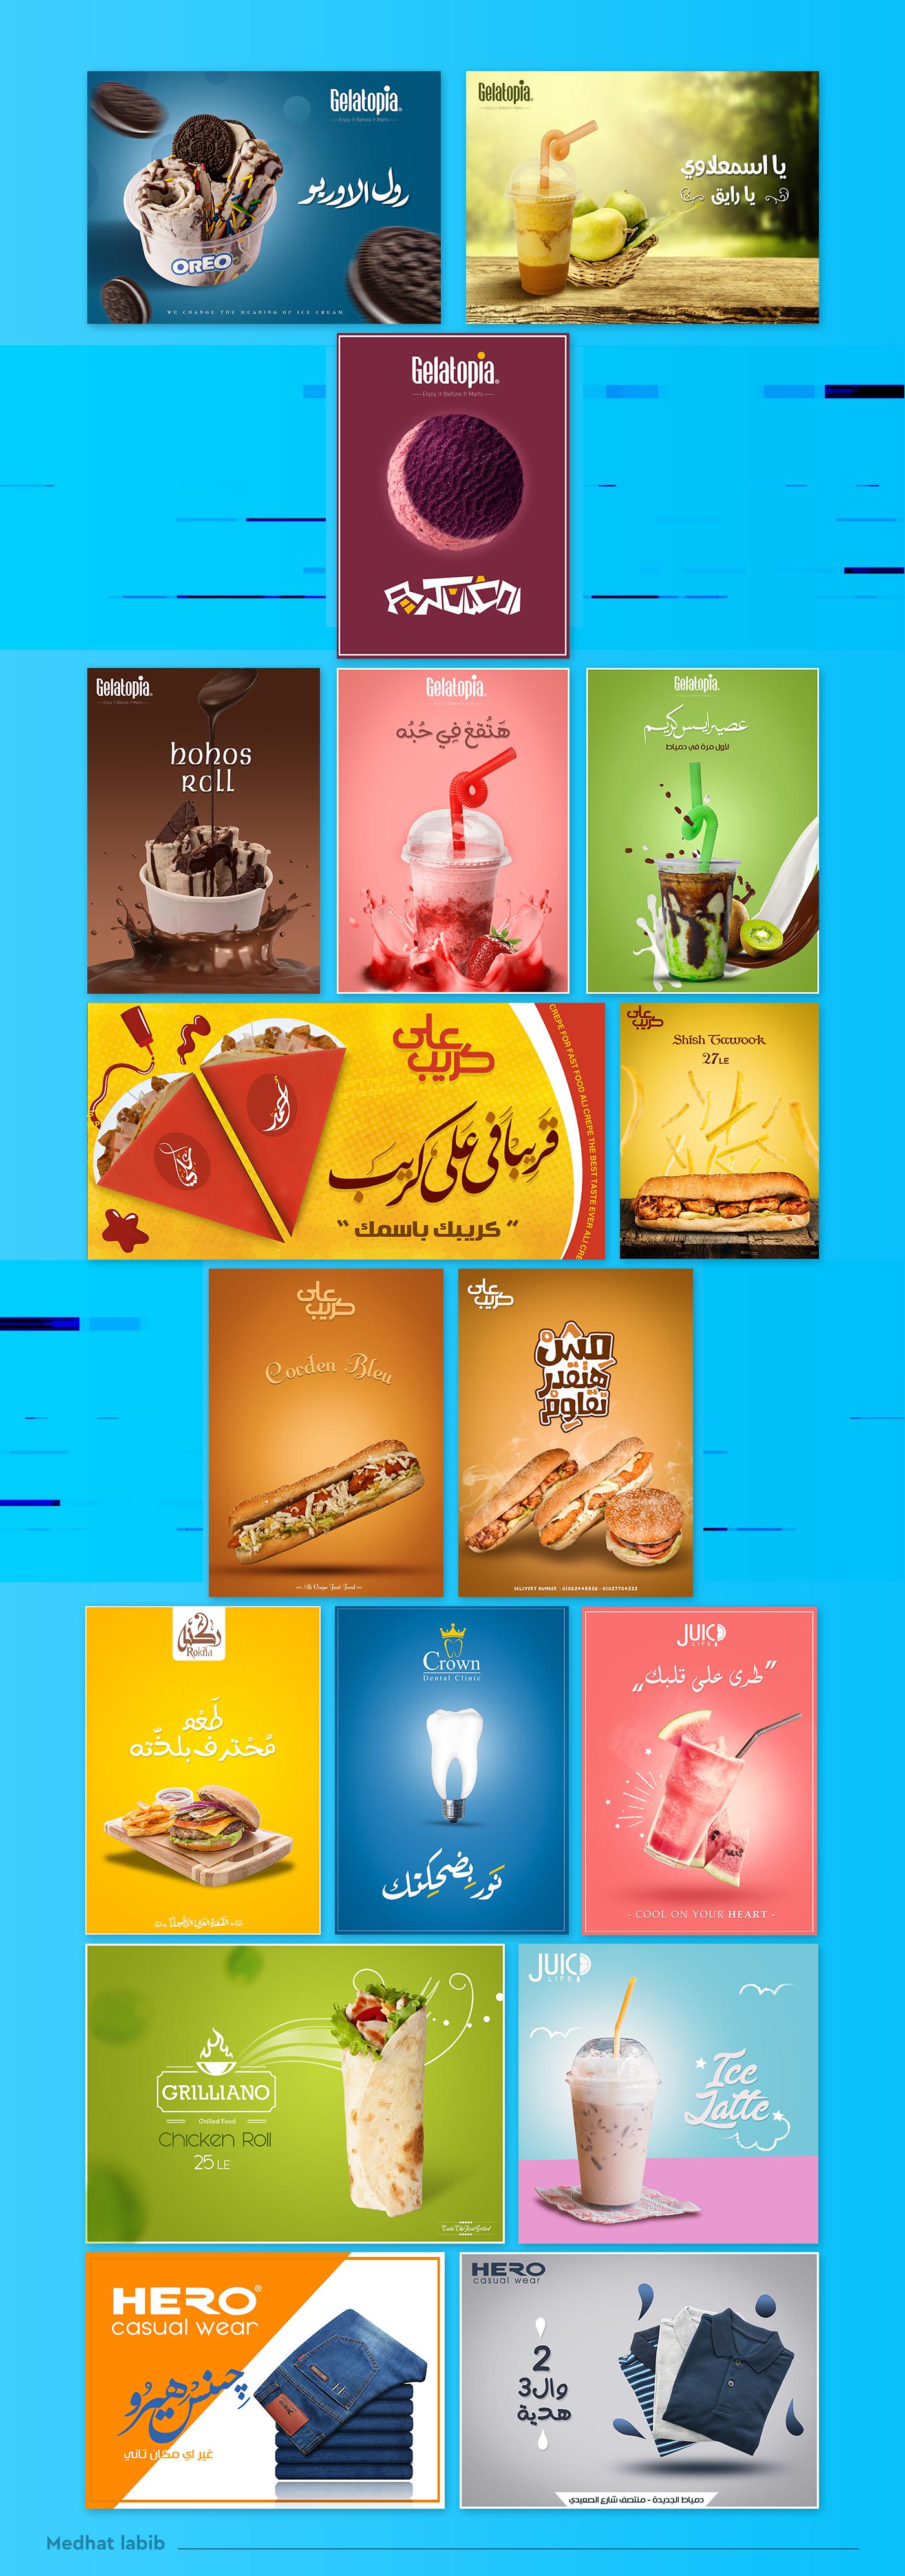 social media design brand post colors manipulation ILLUSTRATION  art direction